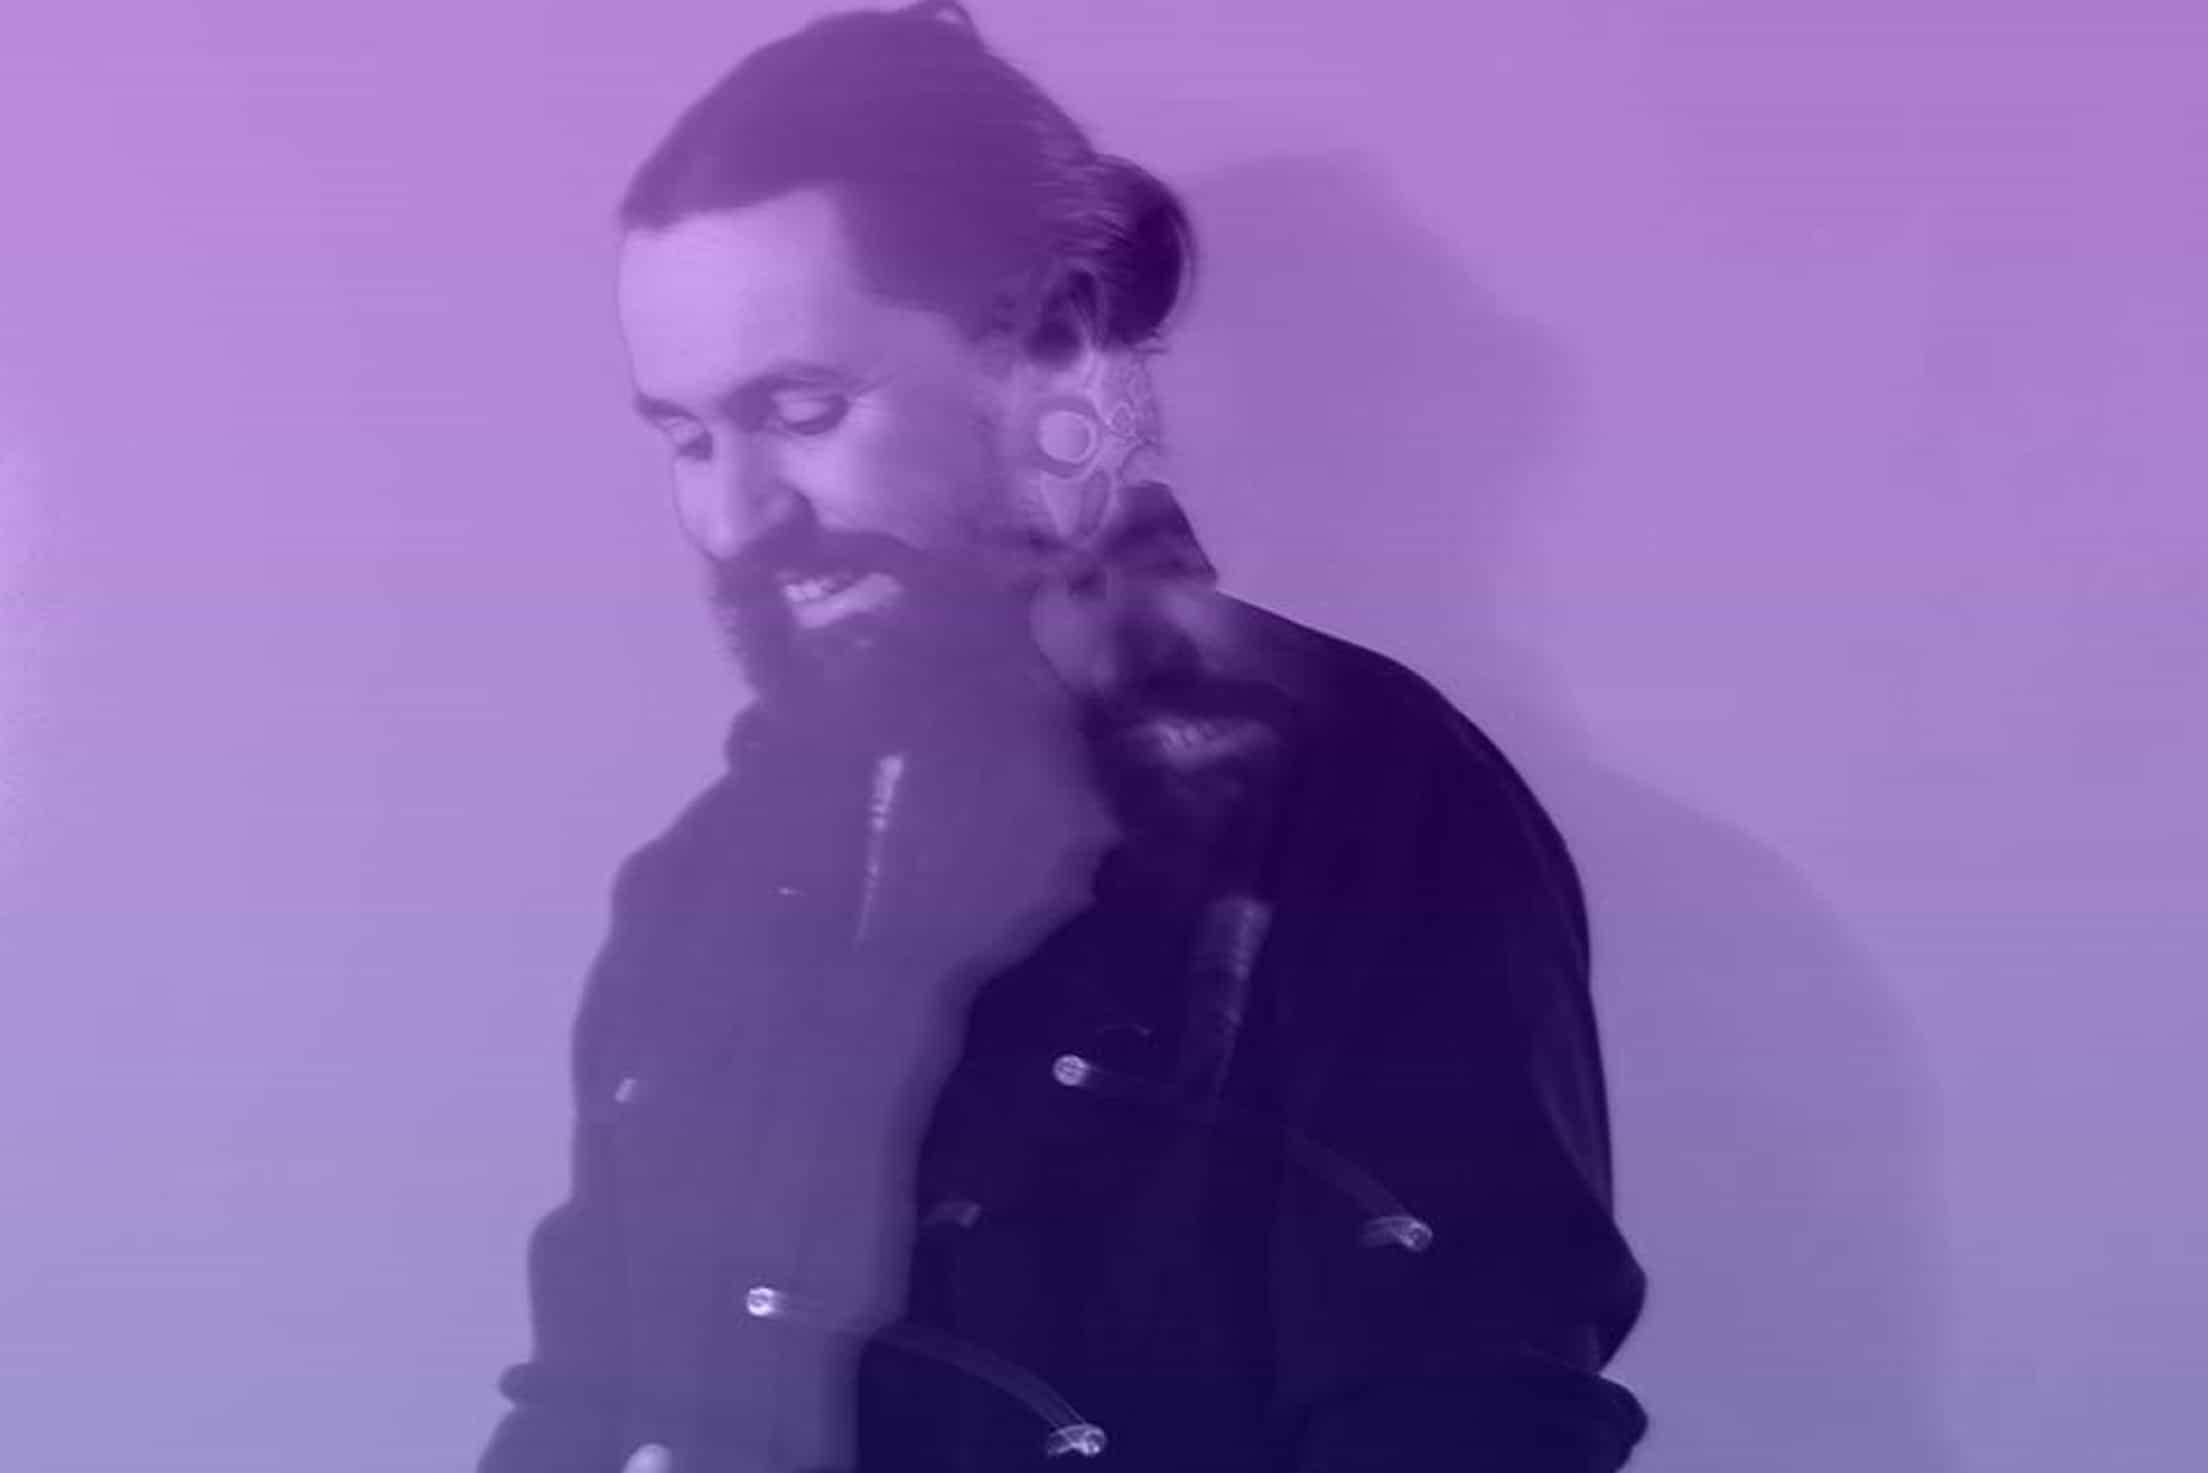 BEN PEARCE – MUSICAL ARTISTRY